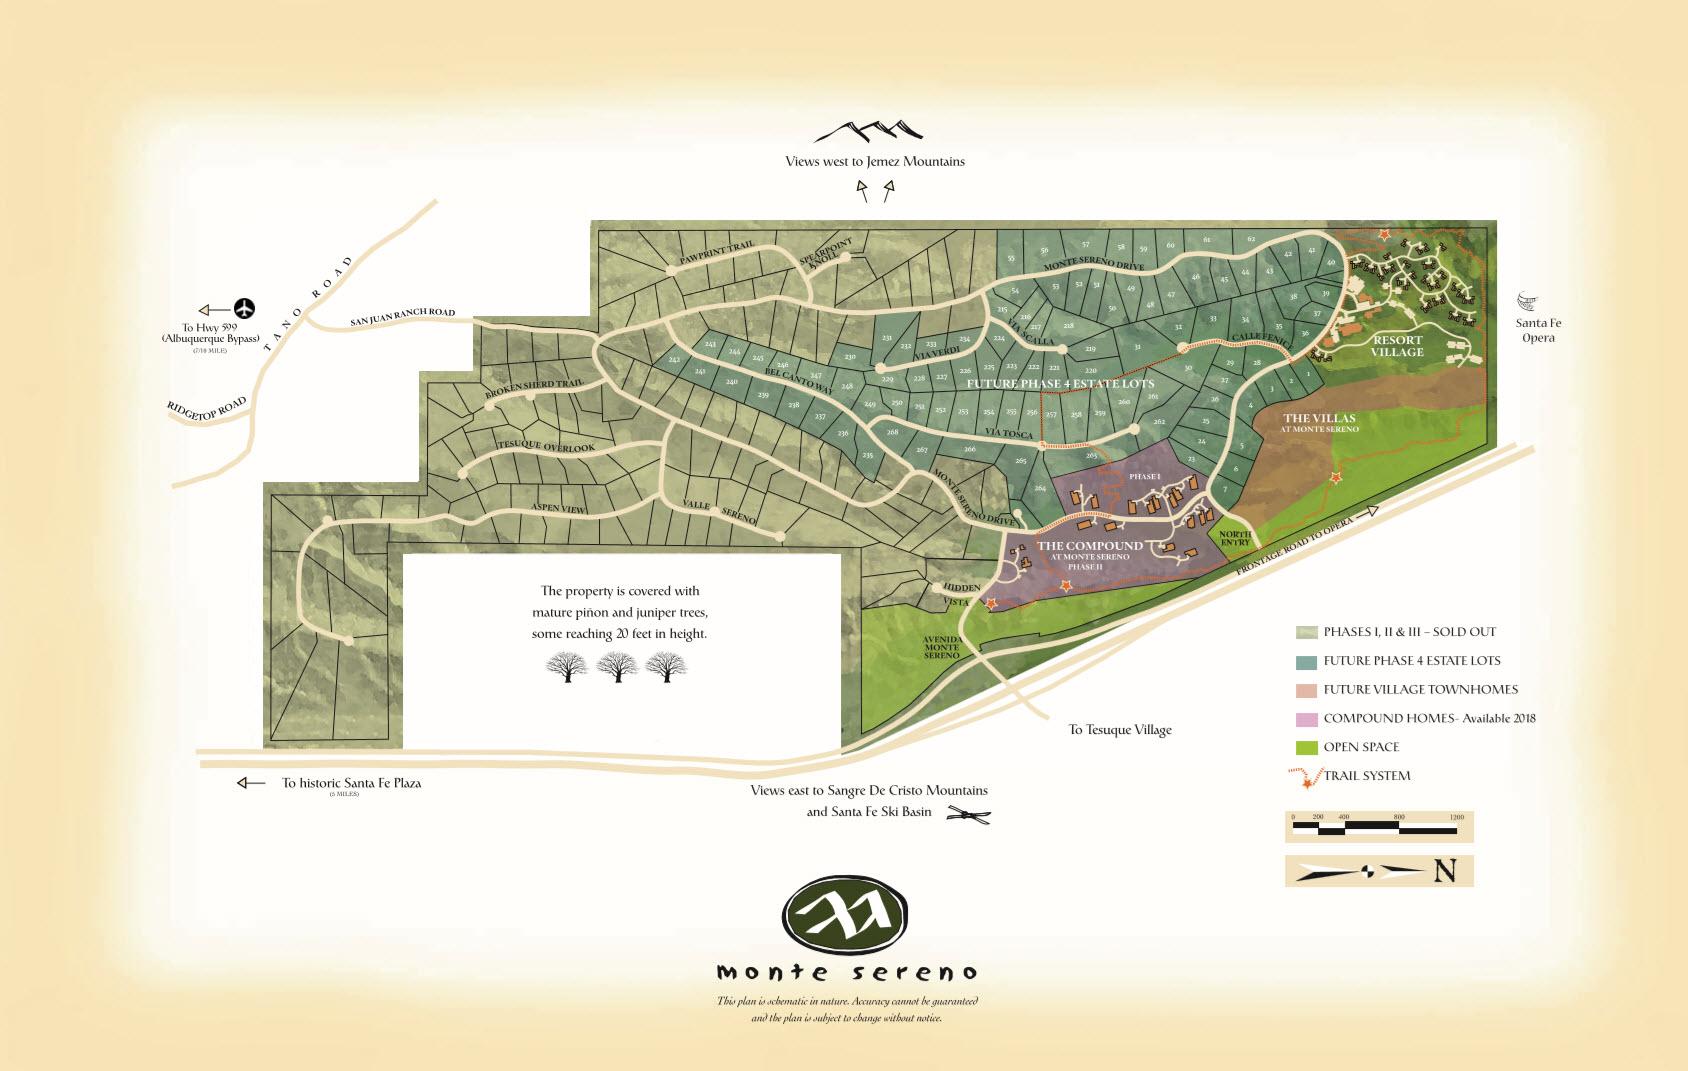 Monte-Sereno-map-Santa-Fe-NM-2018